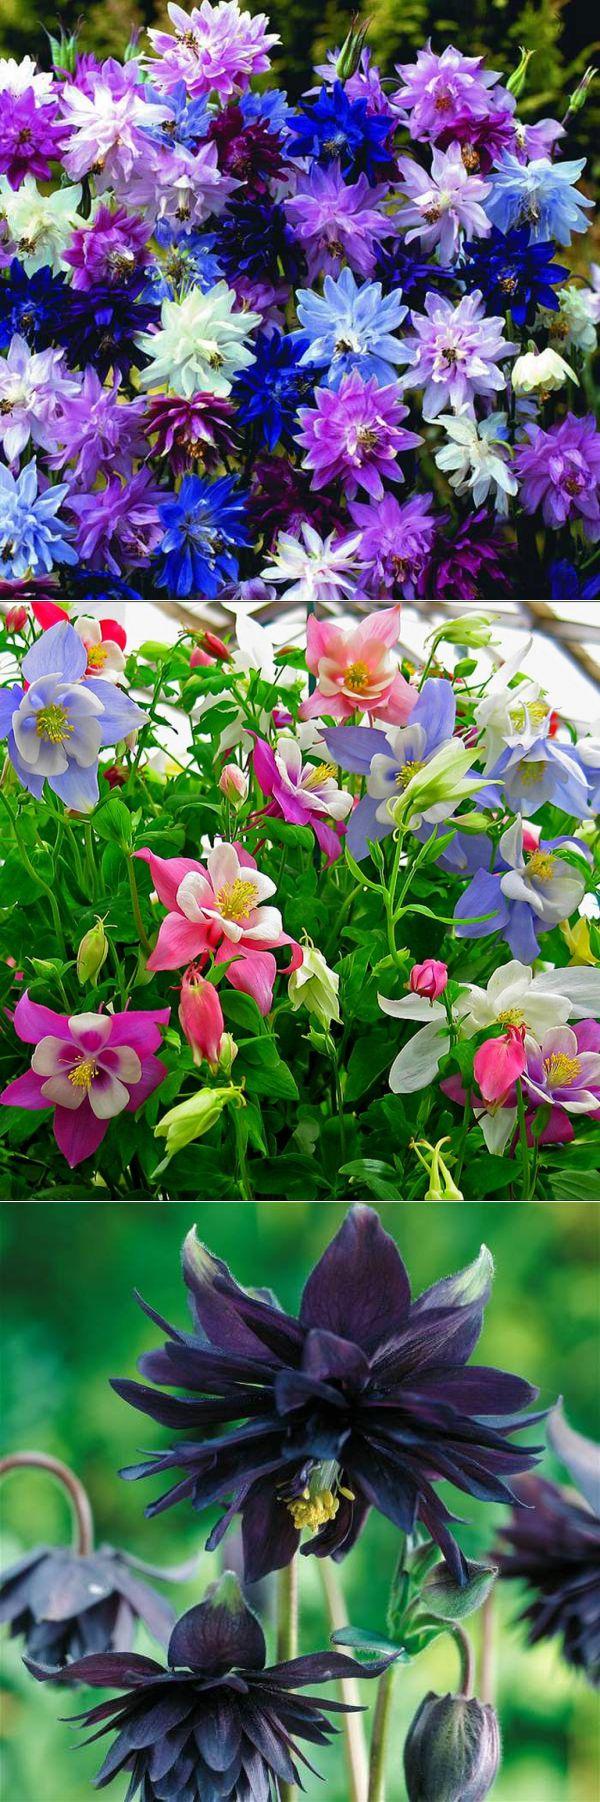 Аквилегия: выращивание из семян в саду